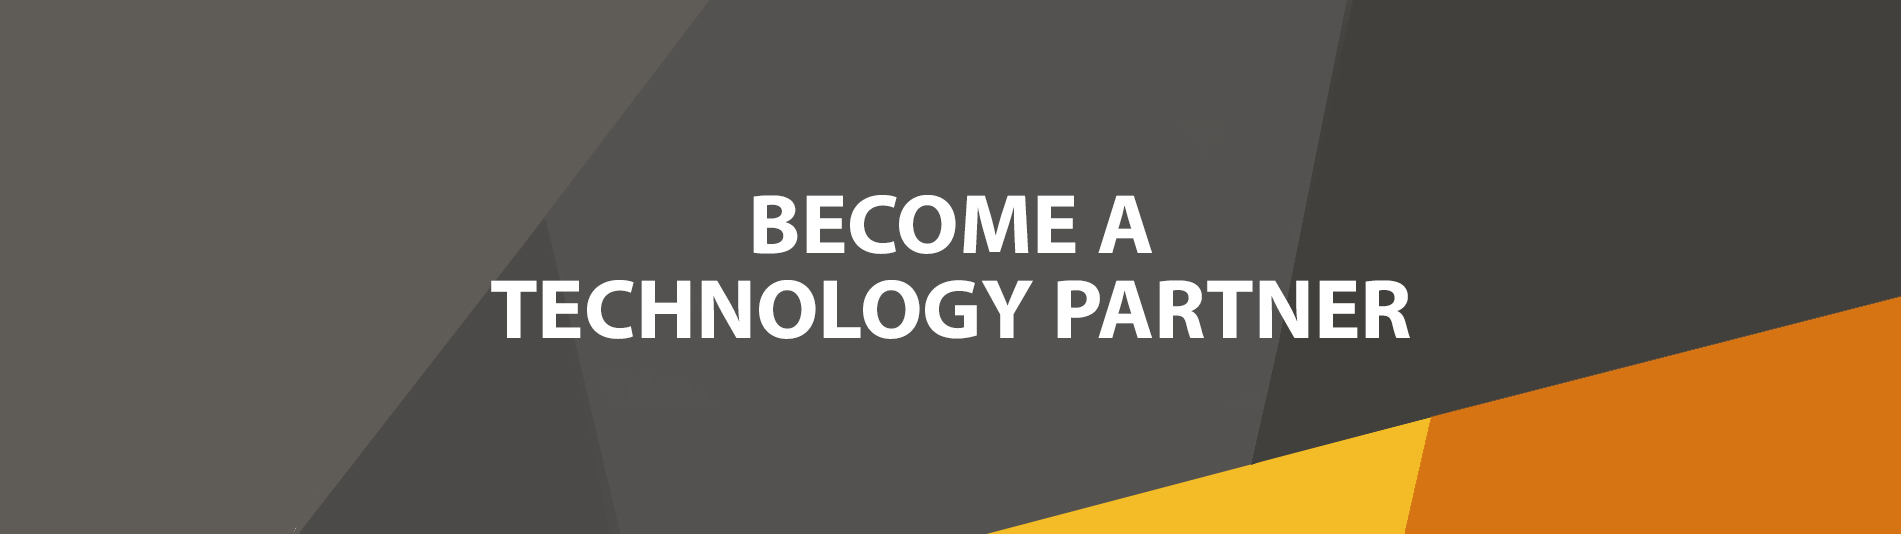 Become a technology partner